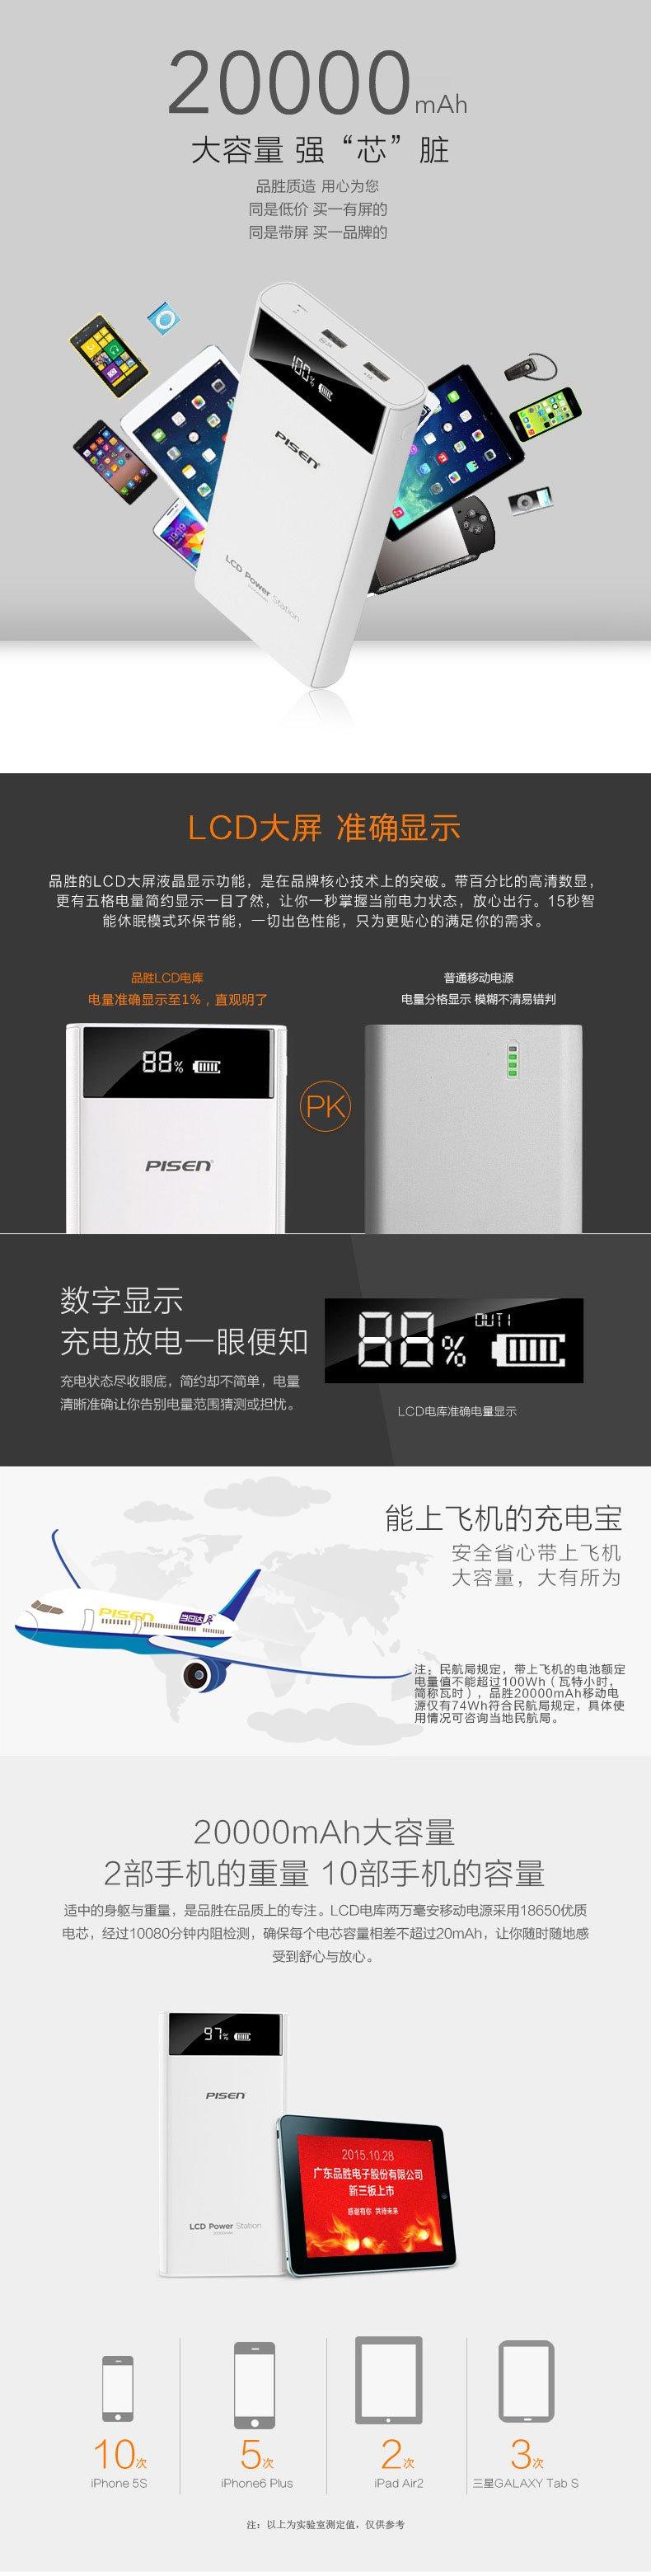 Pisen 品胜 移动电源 LCD电库二代20000mAh 双USB输出 手机/平板通用充电宝